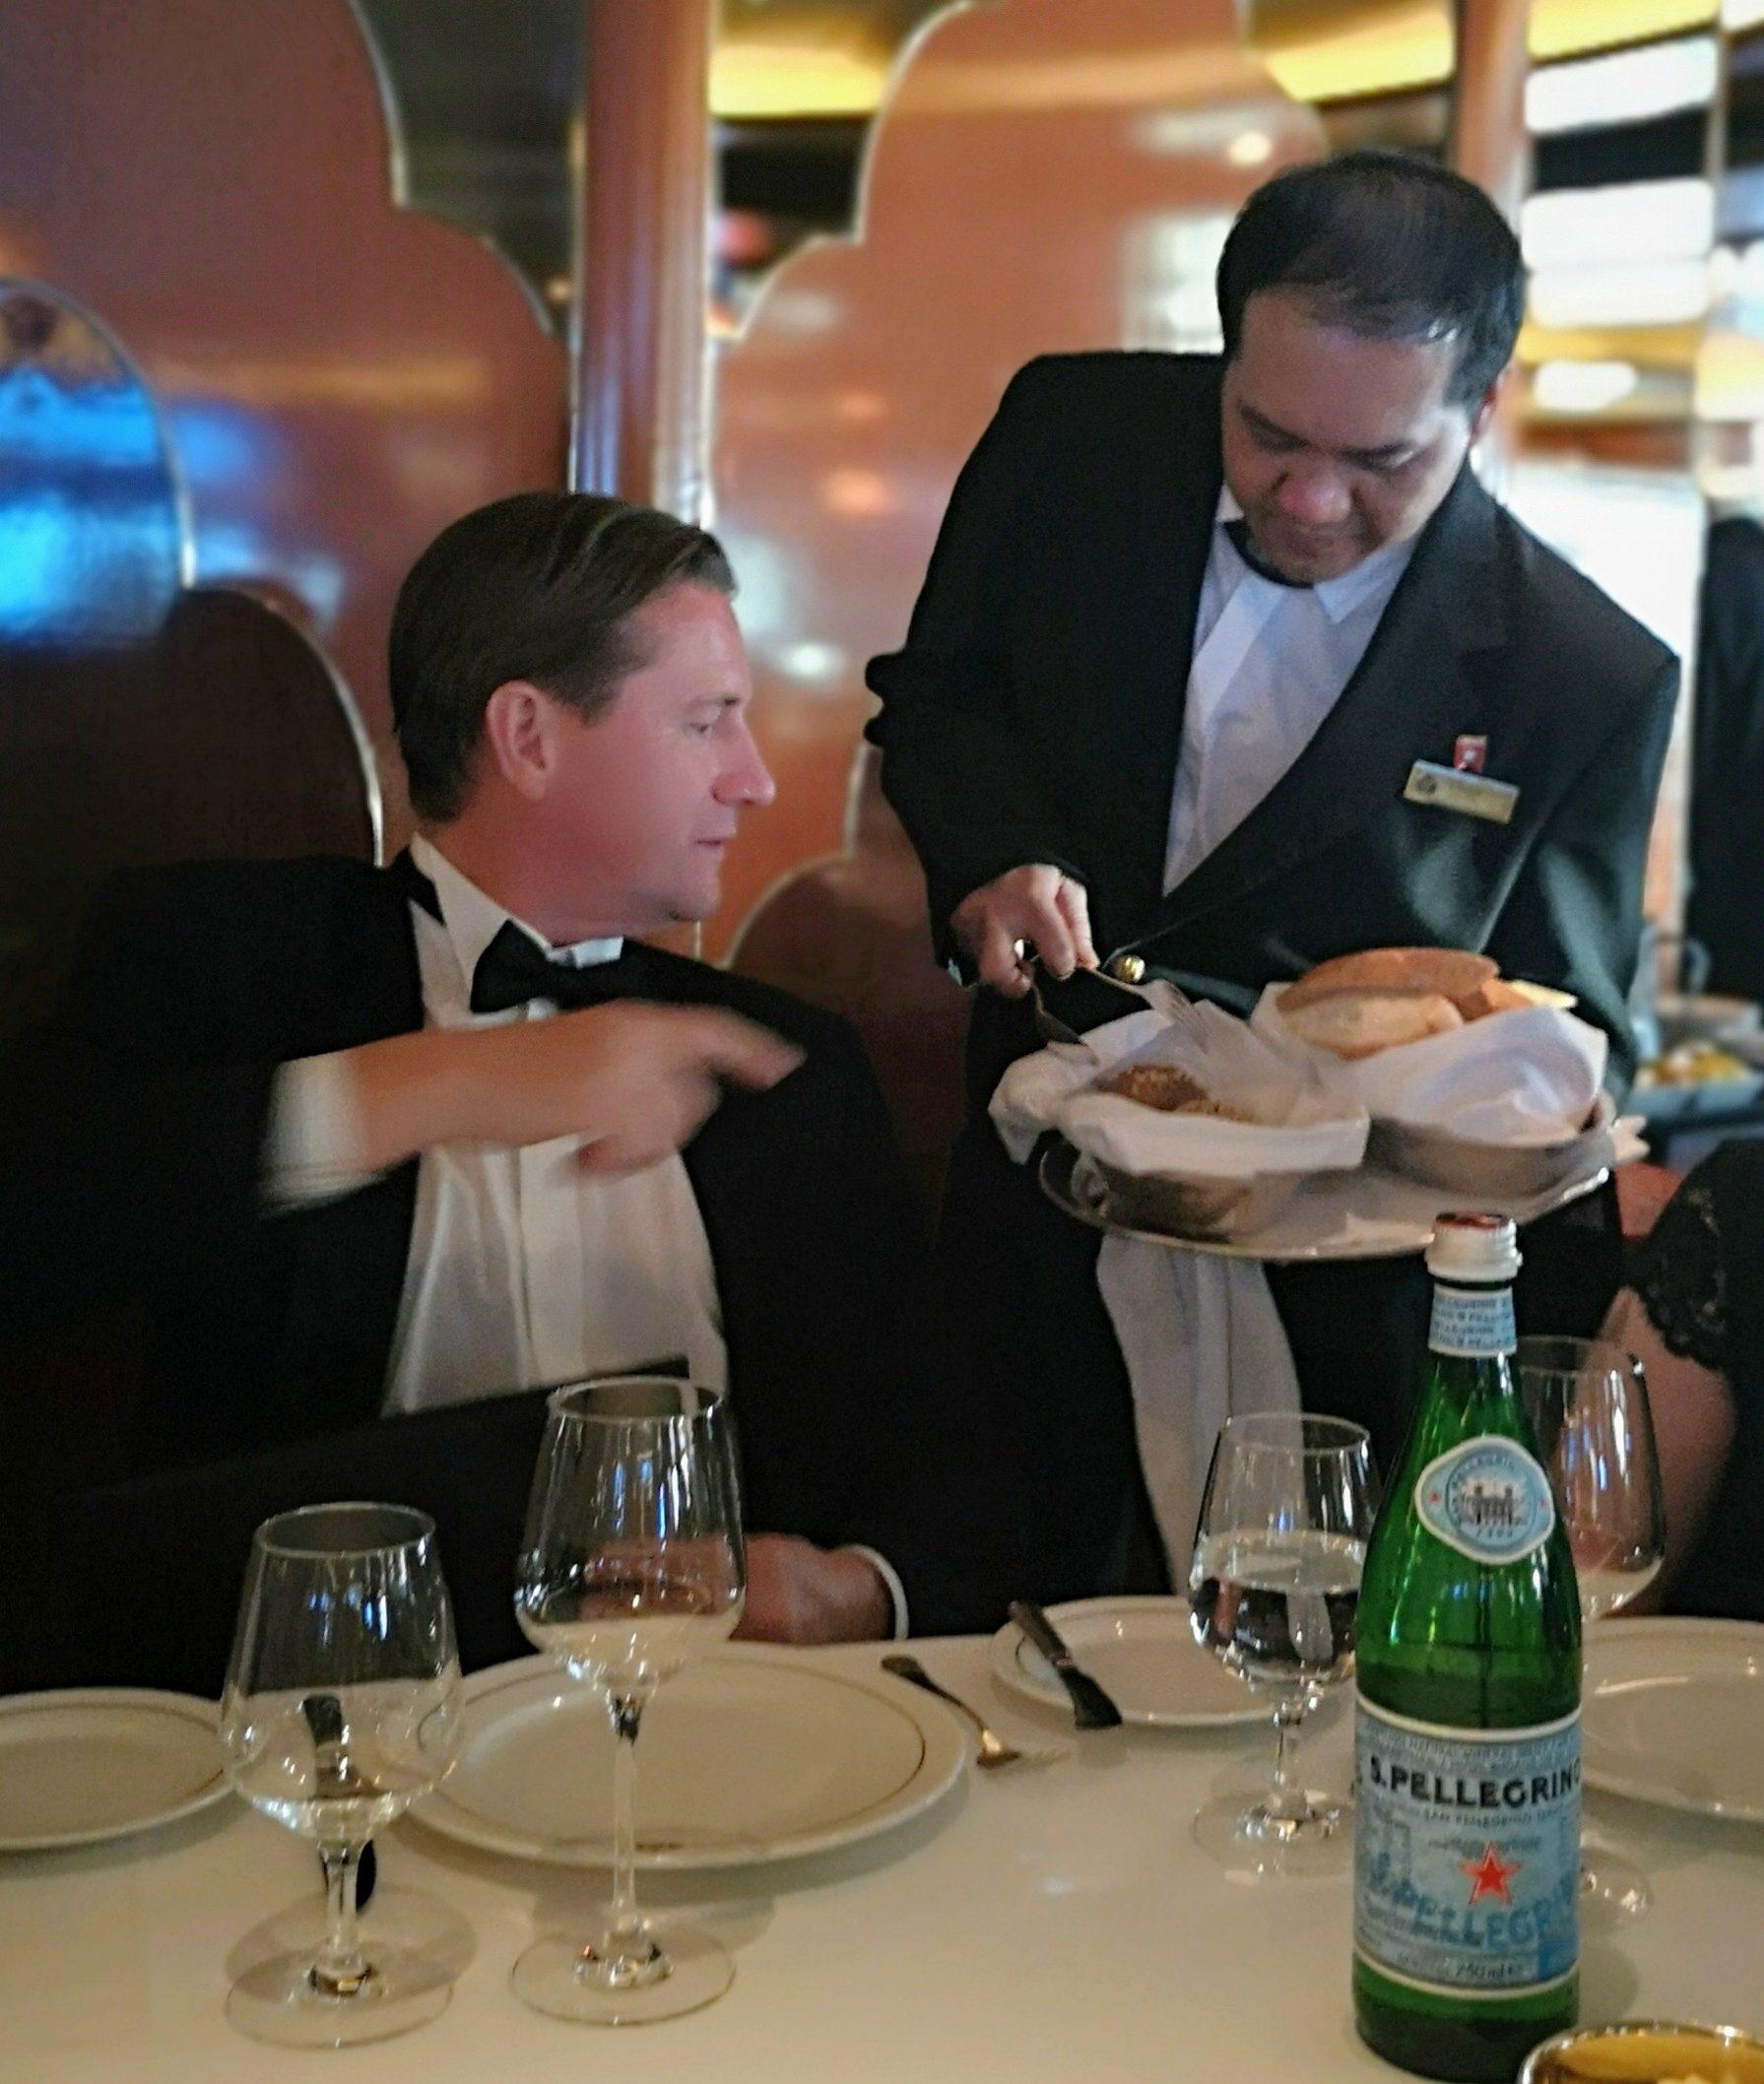 Luxuskreuzfahrt Experte Michael Seibert beim Gala Abend an Bord der Queen Victoria